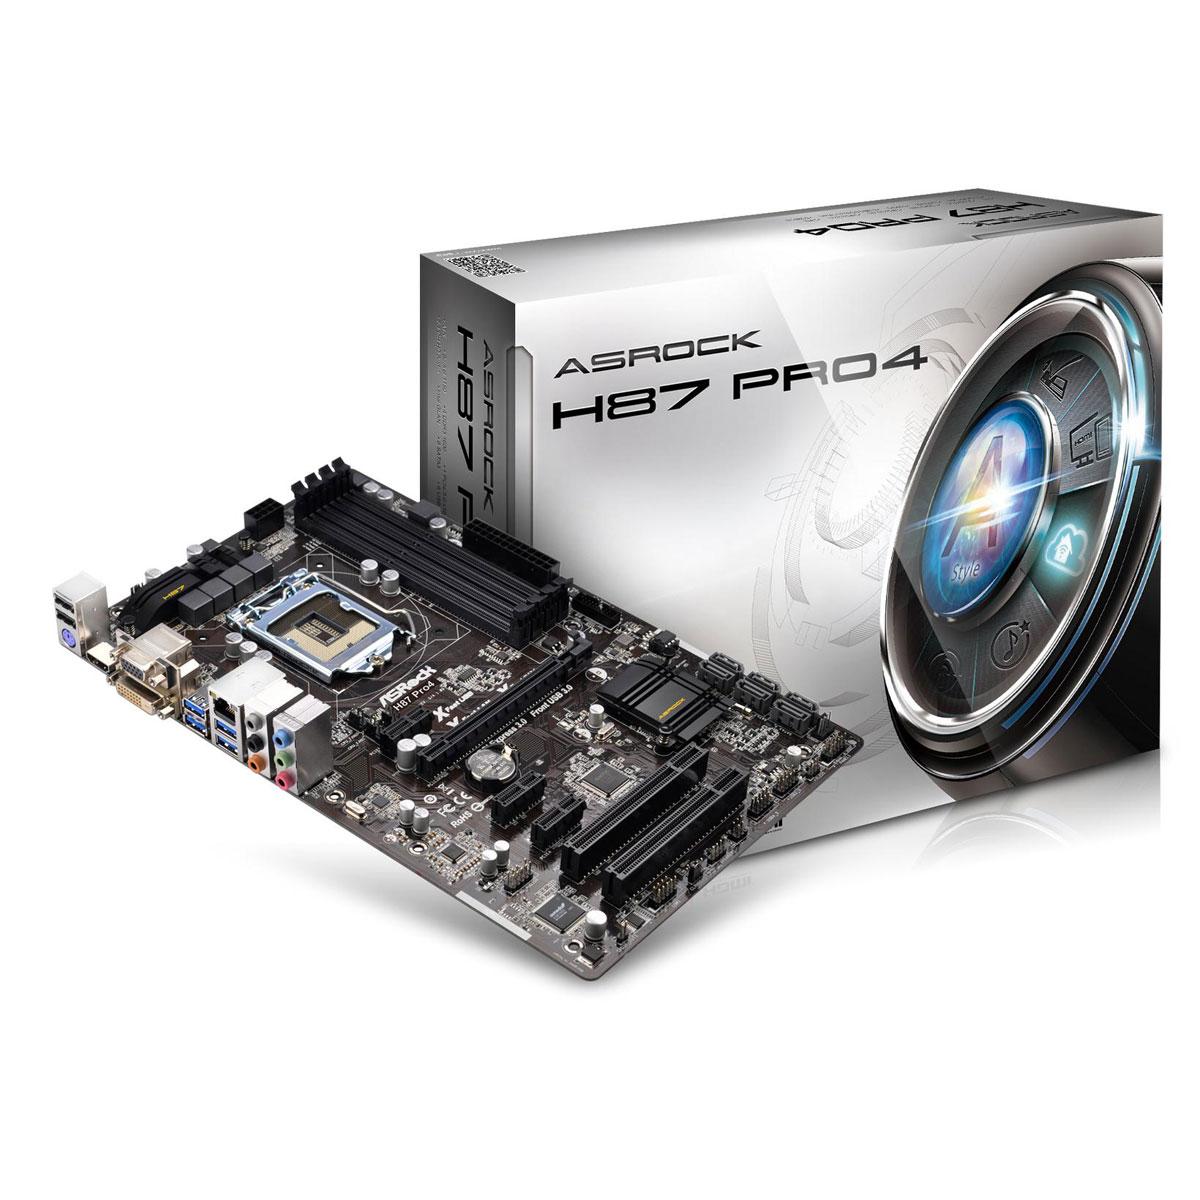 Carte mère ASRock H87 Pro4 Carte mère ATX Socket 1150 Intel H87 Express - SATA 6Gb/s - USB 3.0 - 1x PCI-Express 3.0 16x